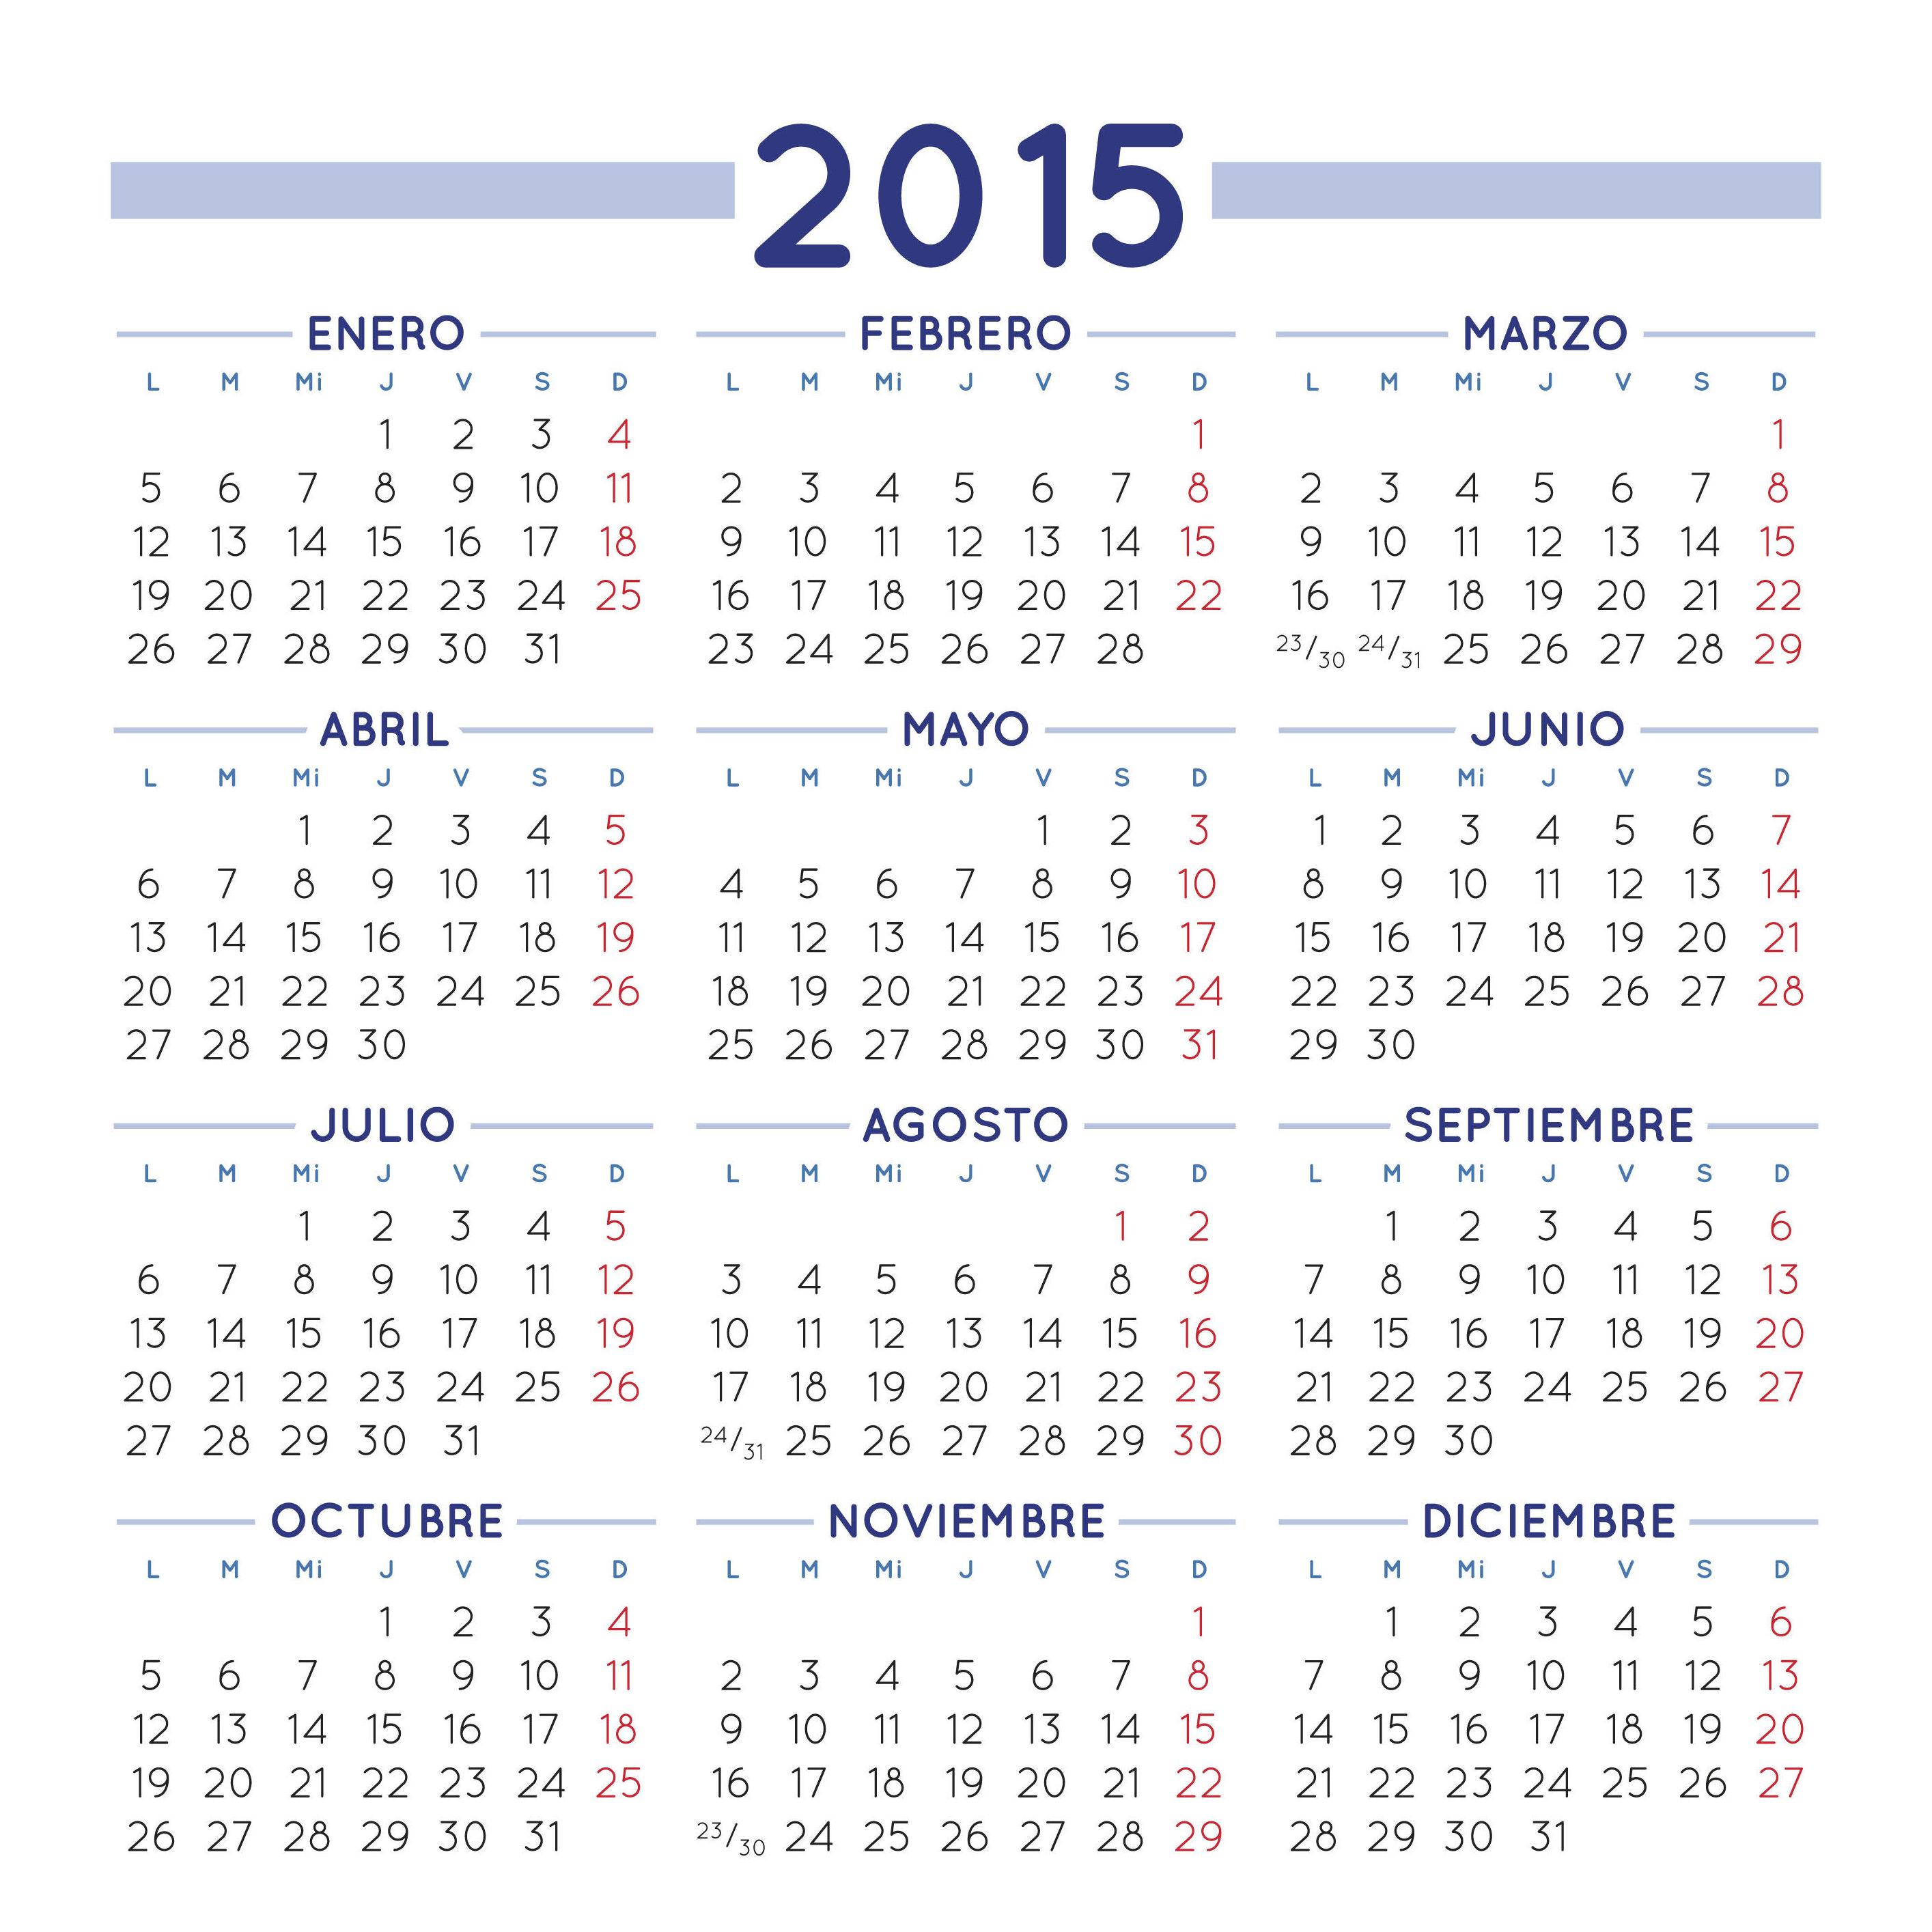 Novedades Reglamento Circulación 2015